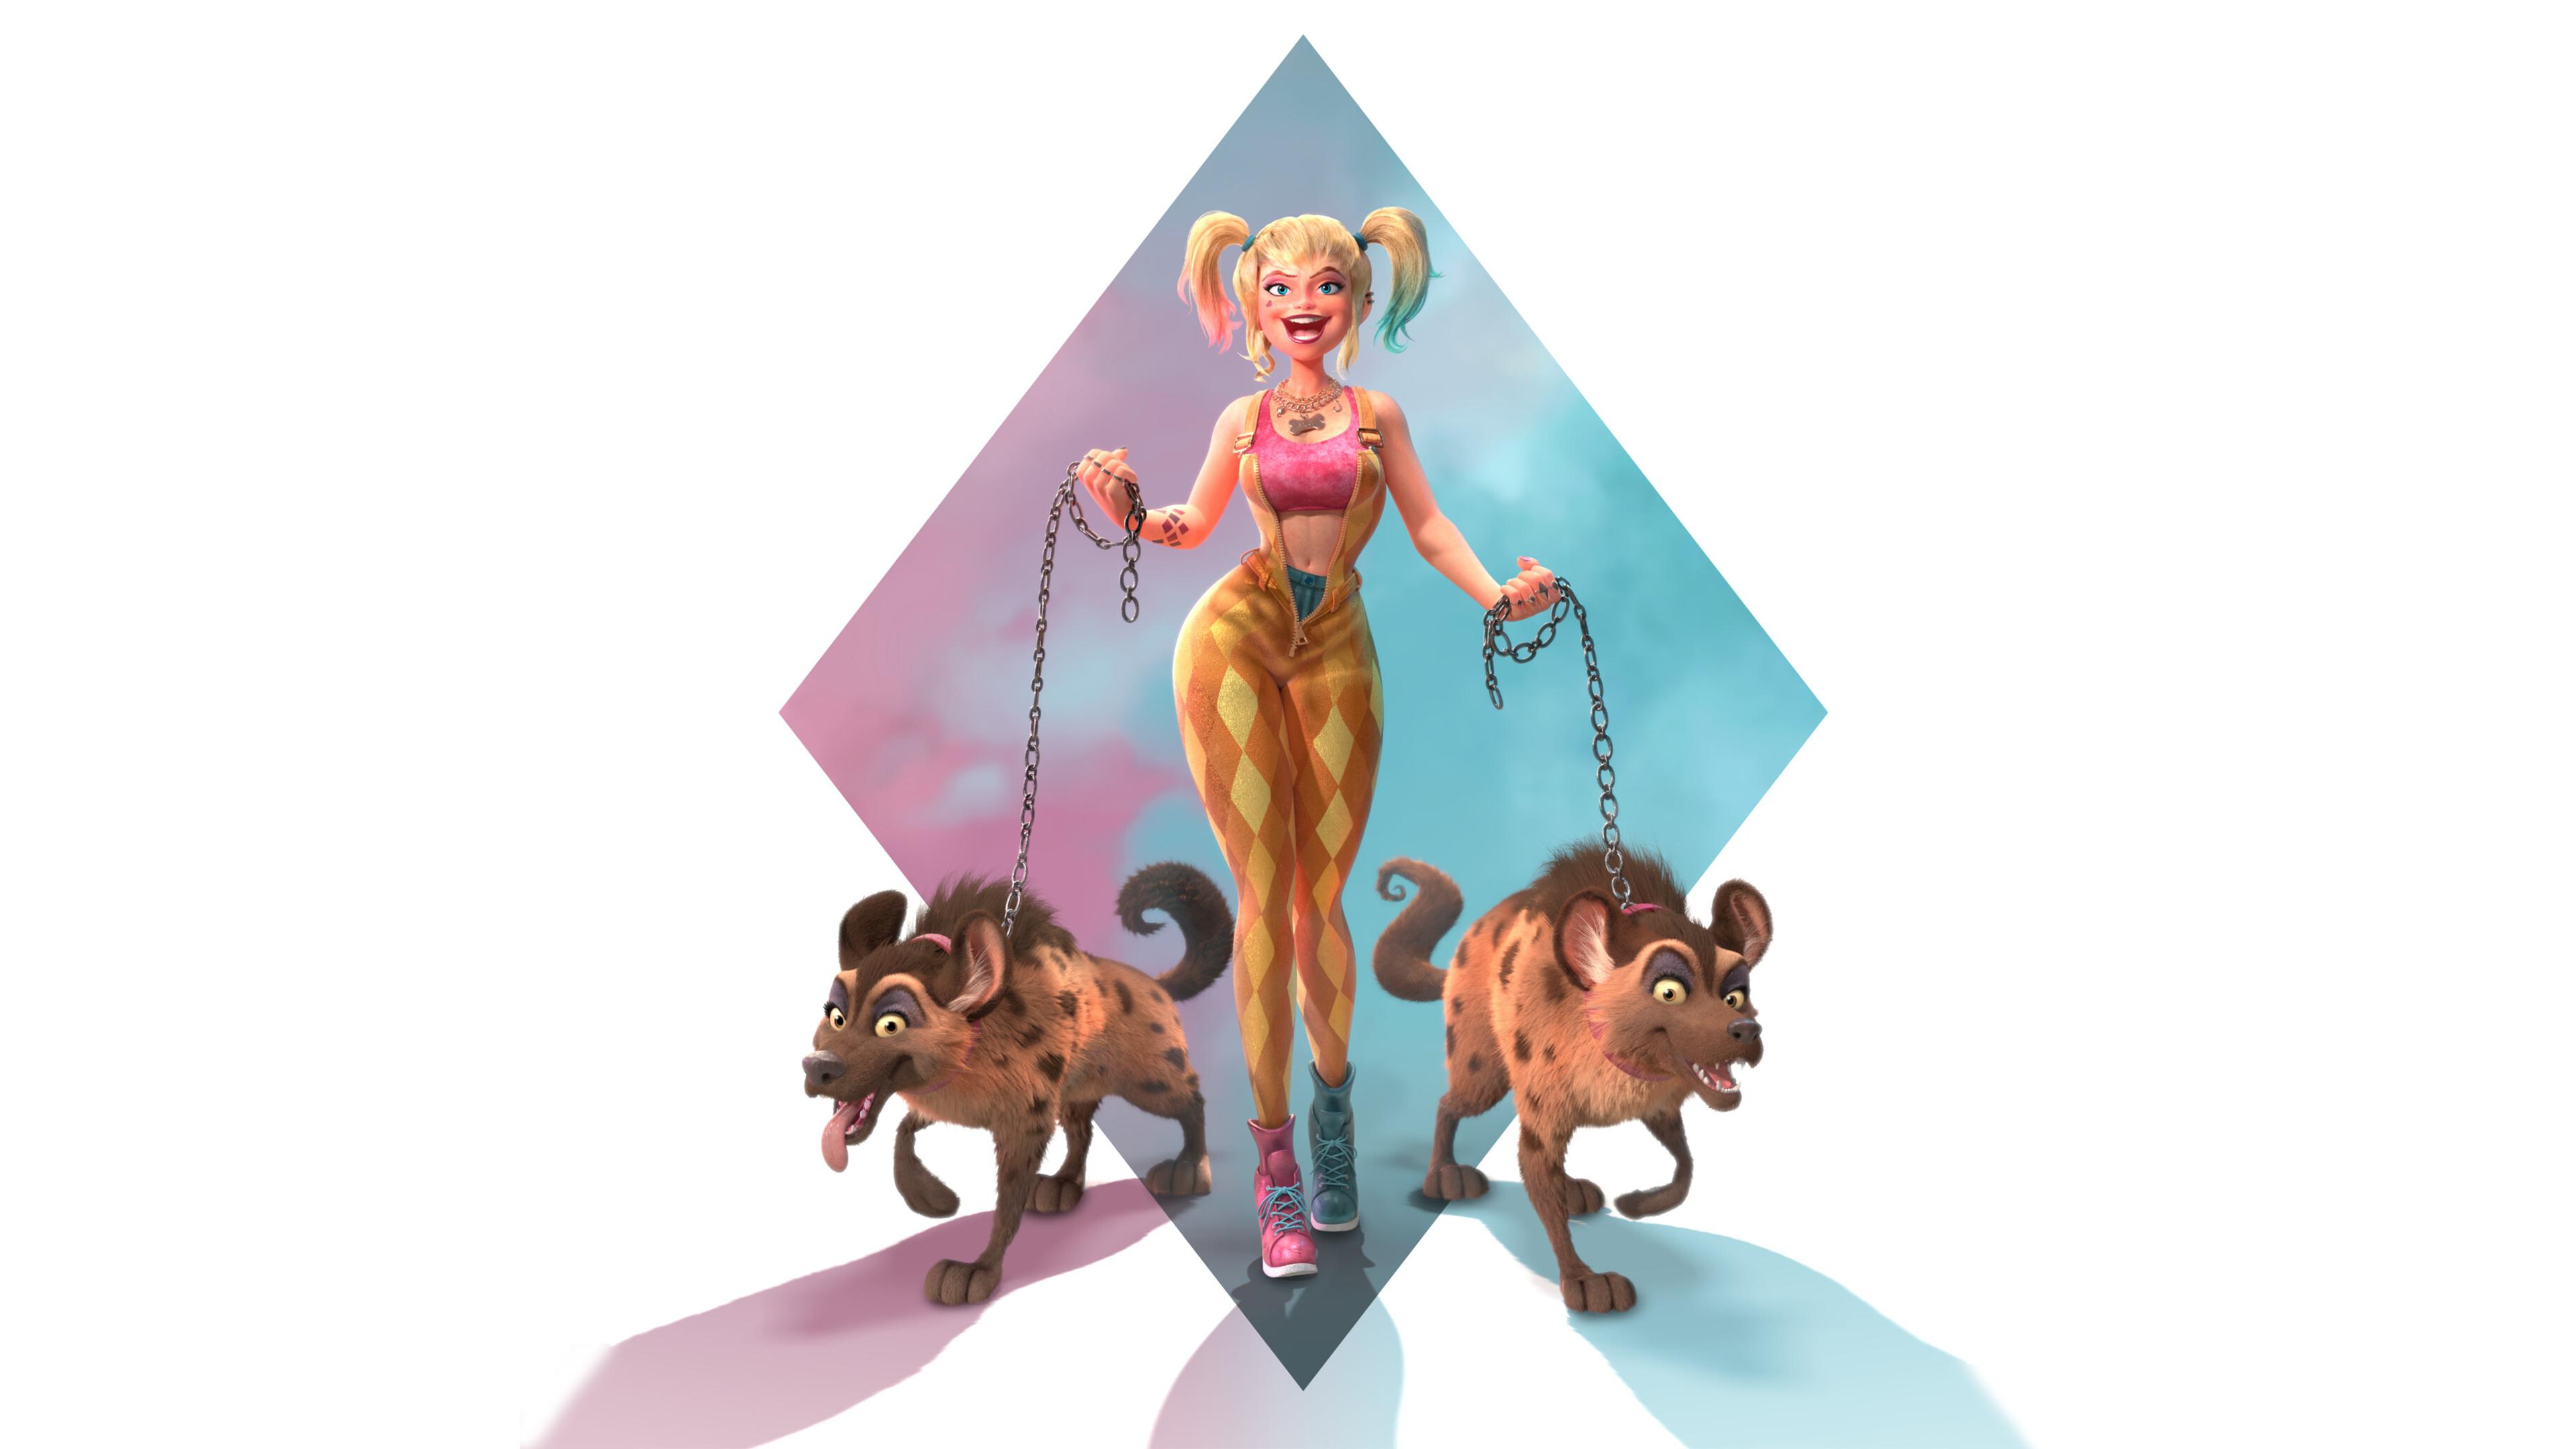 harley quinn with hyenas 4k 1602419840 - Harley Quinn With Hyenas 4k - Harley Quinn With Hyenas 4k wallpapers